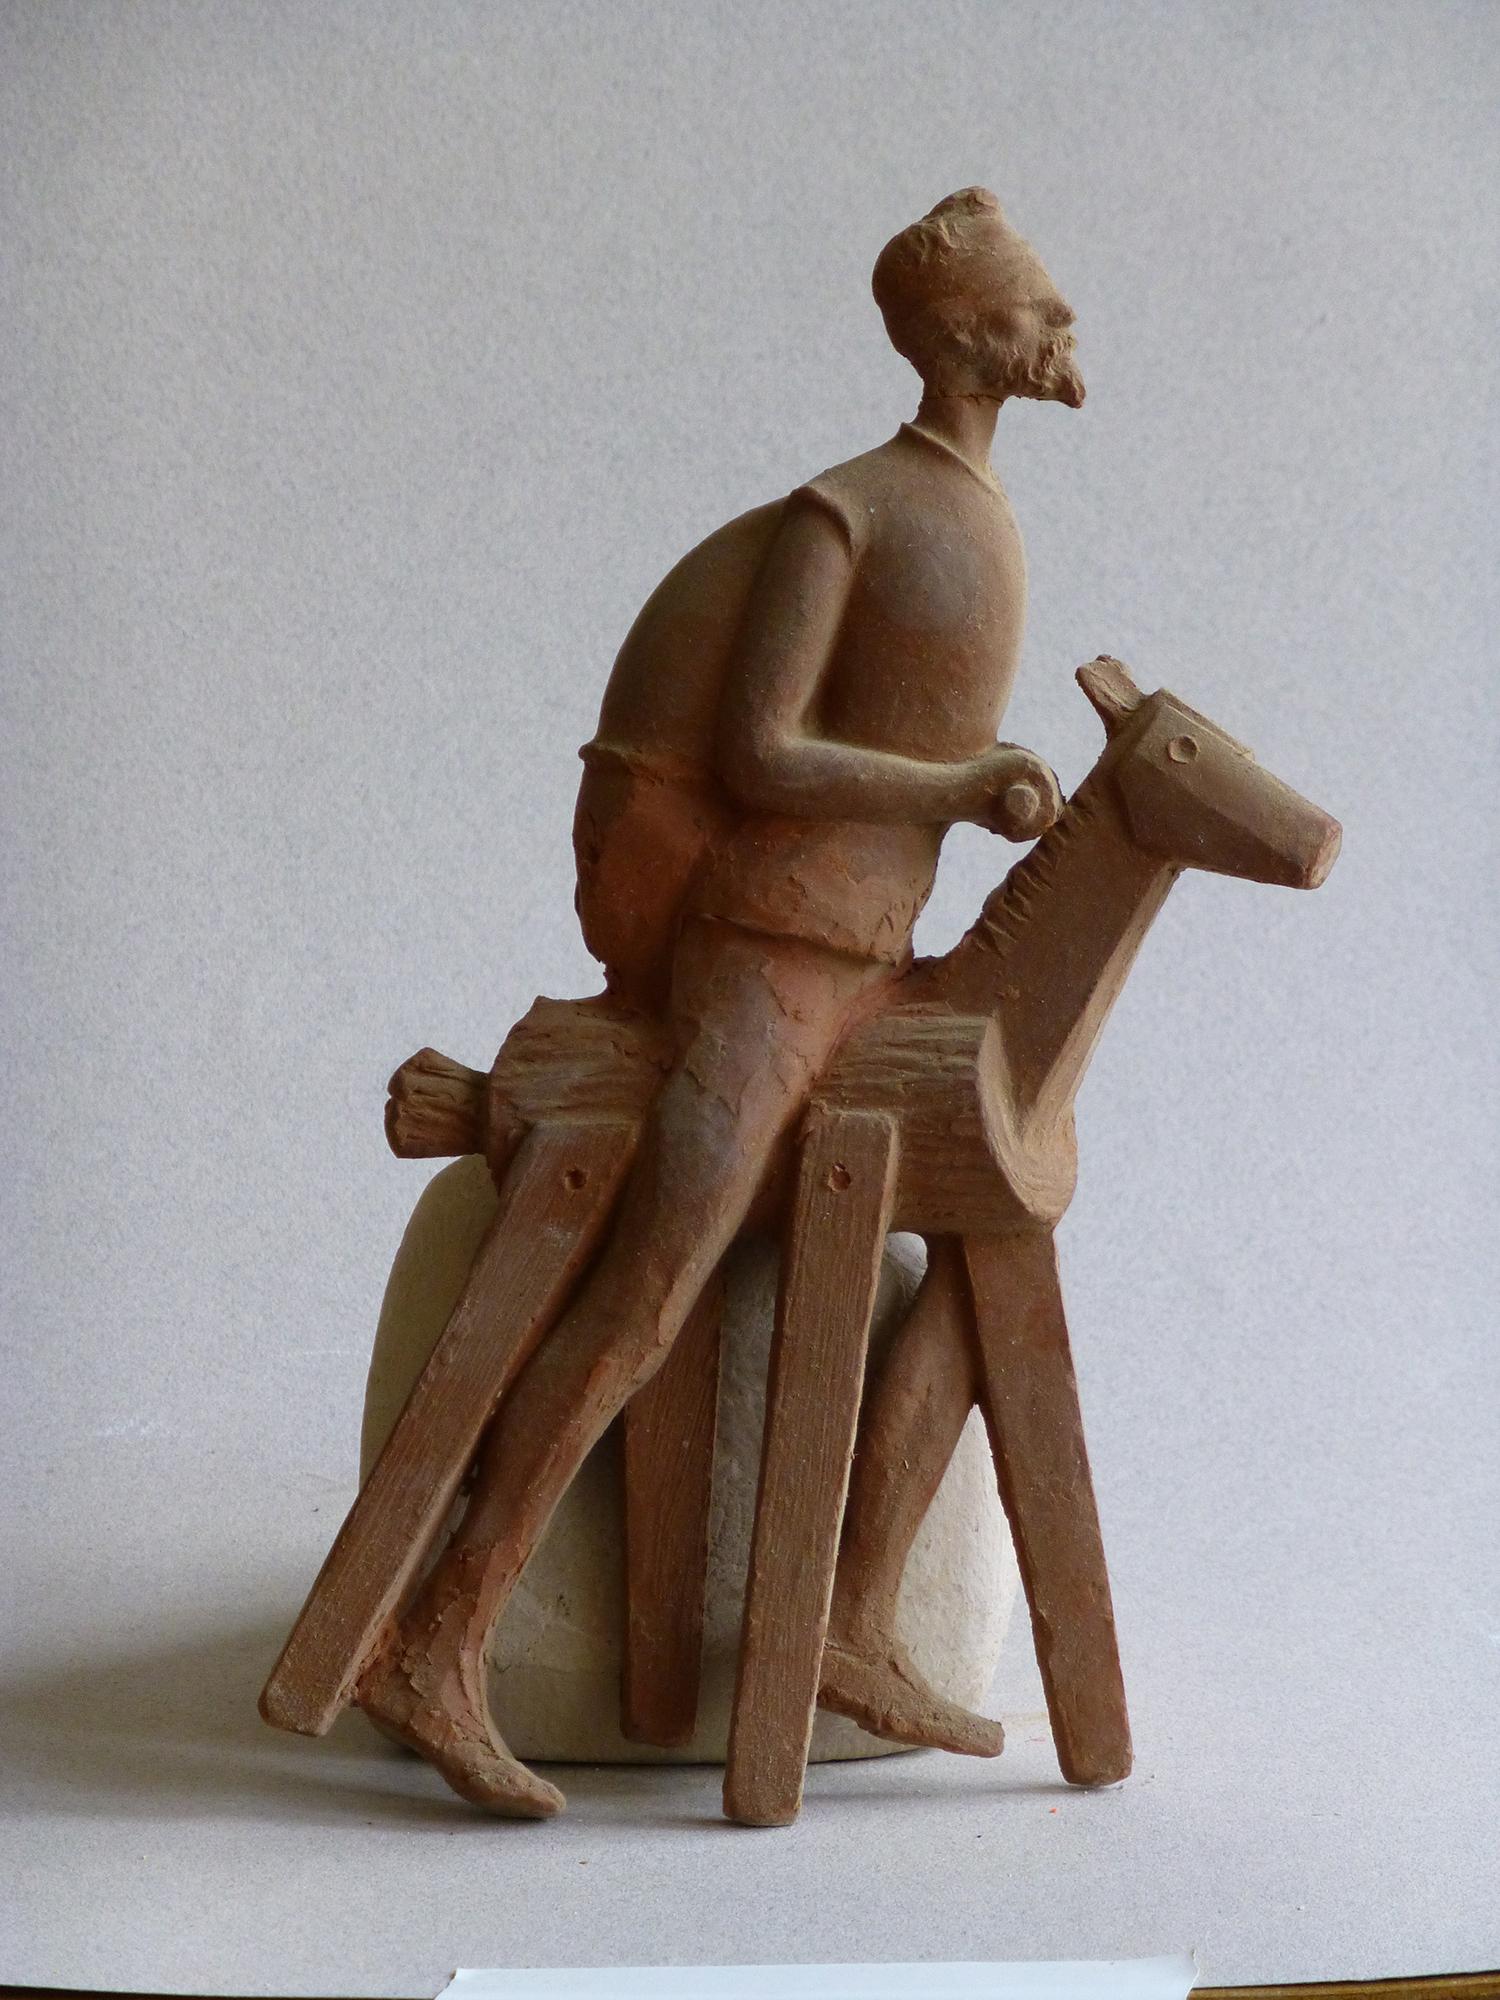 1979.1. Don Quijote montado en clavileño, Trofeo, bronce, 20x10x2,05 cms. Premios Quijote 1980, R.N.E. 1979